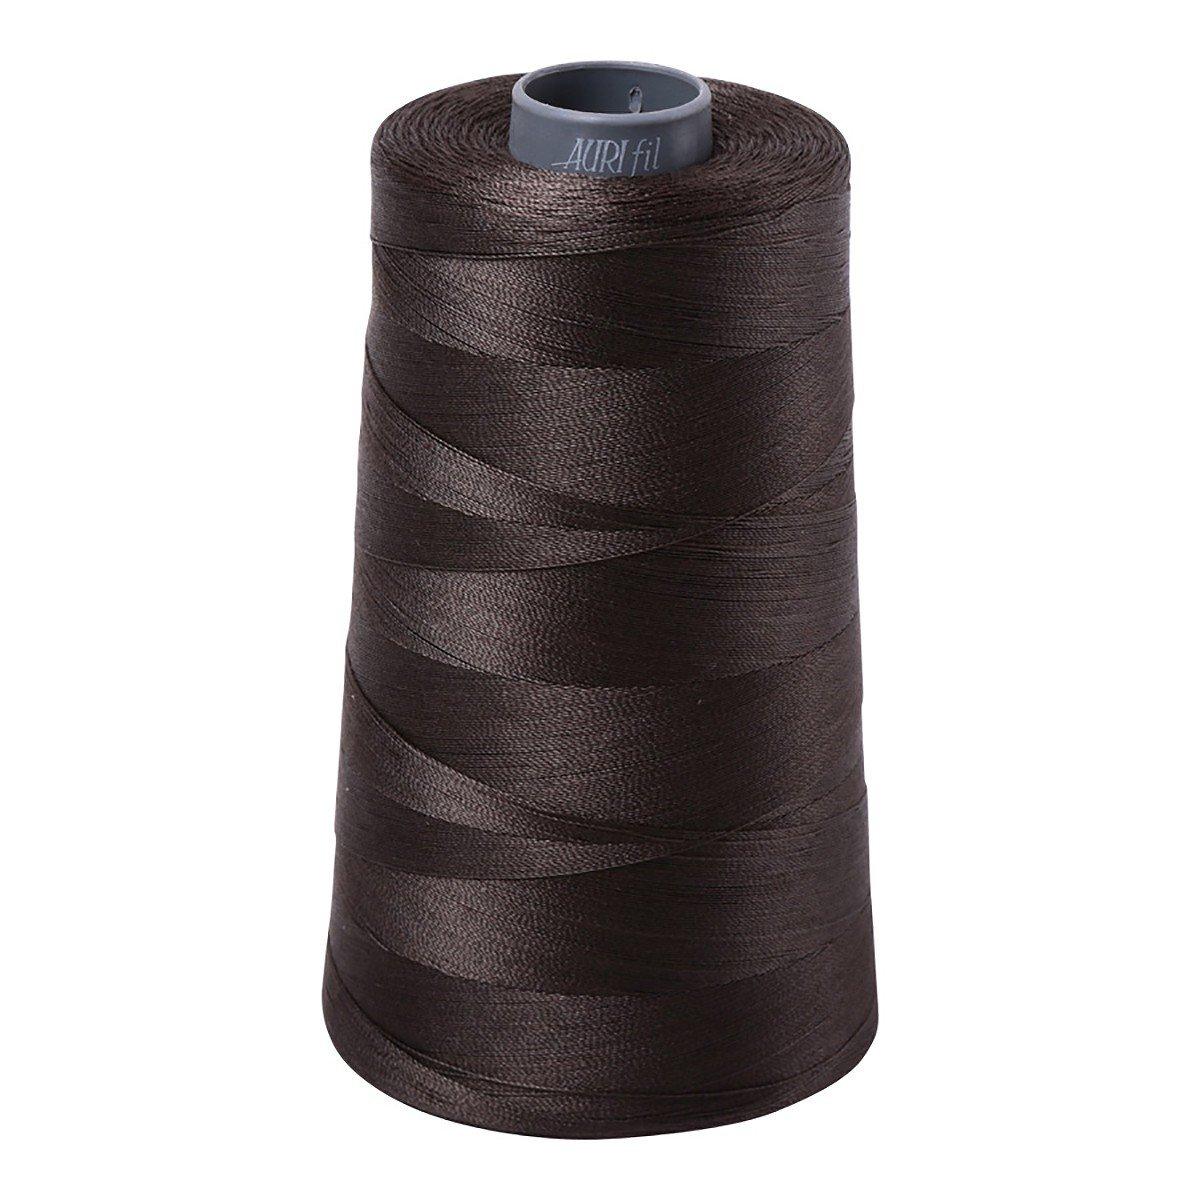 Mako (Cotton) Embroidery Thread 28wt 3609yds Asphalt